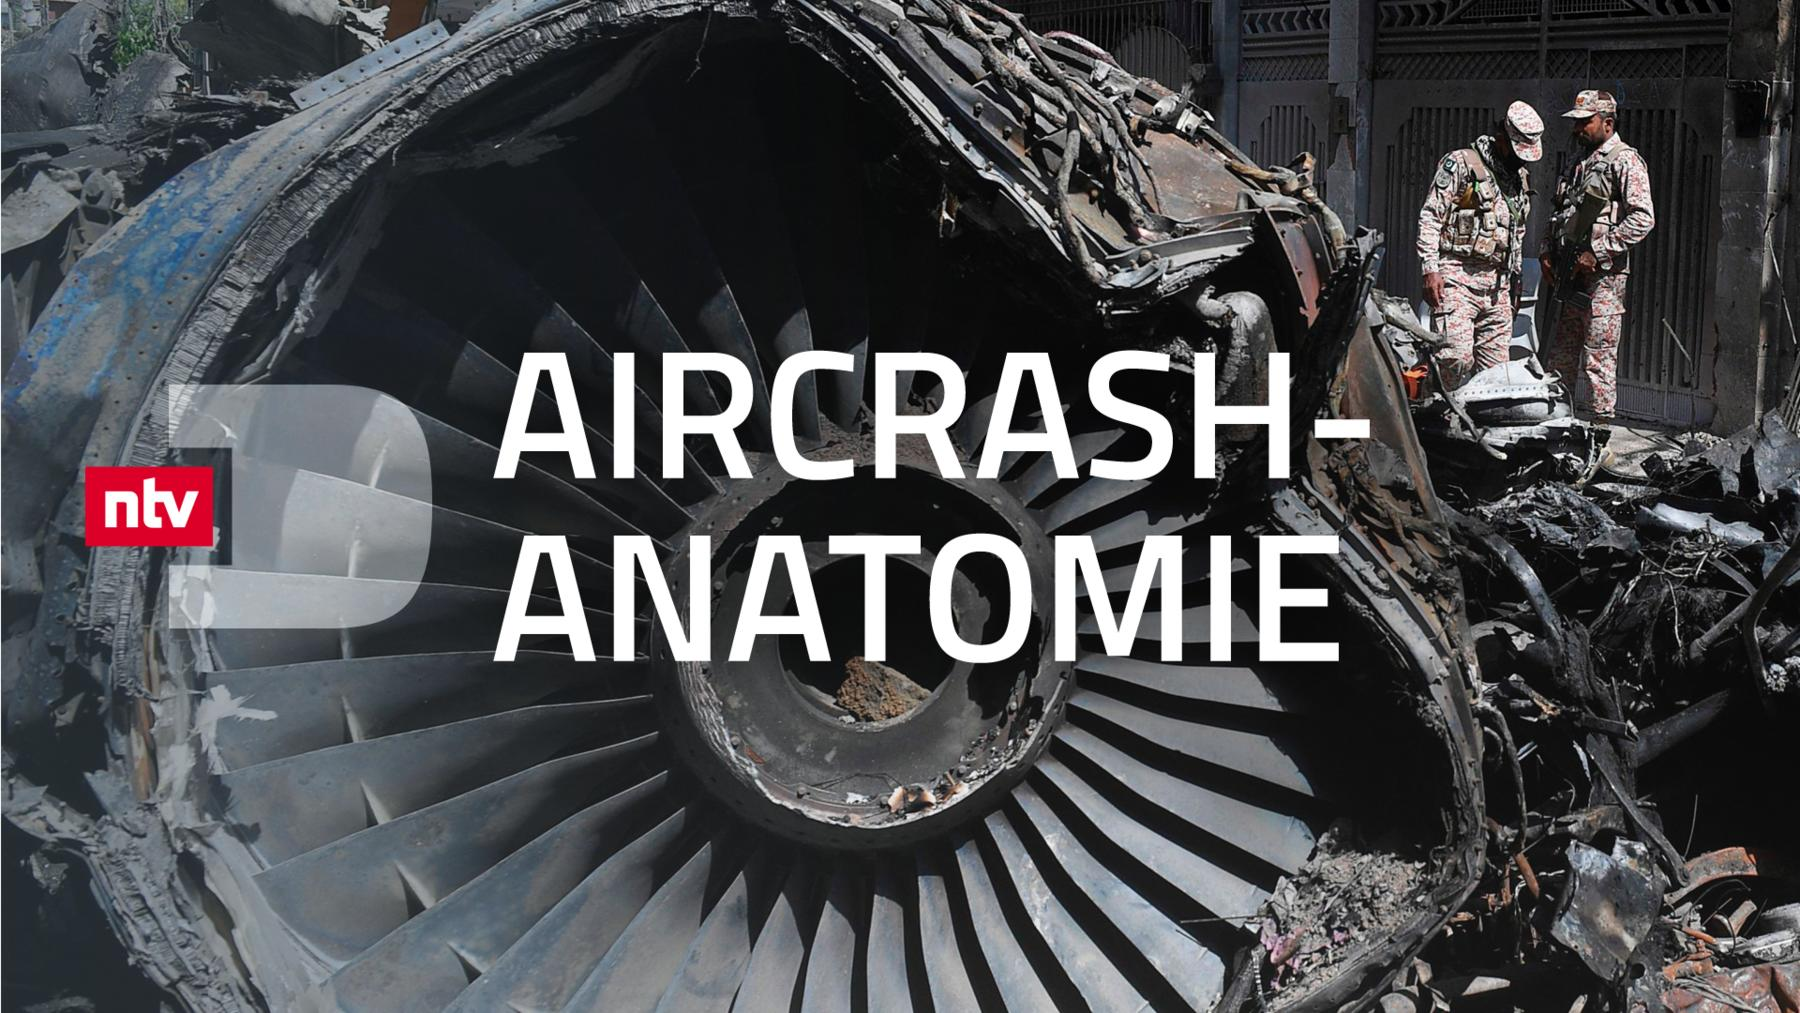 Aircrash-Anatomie